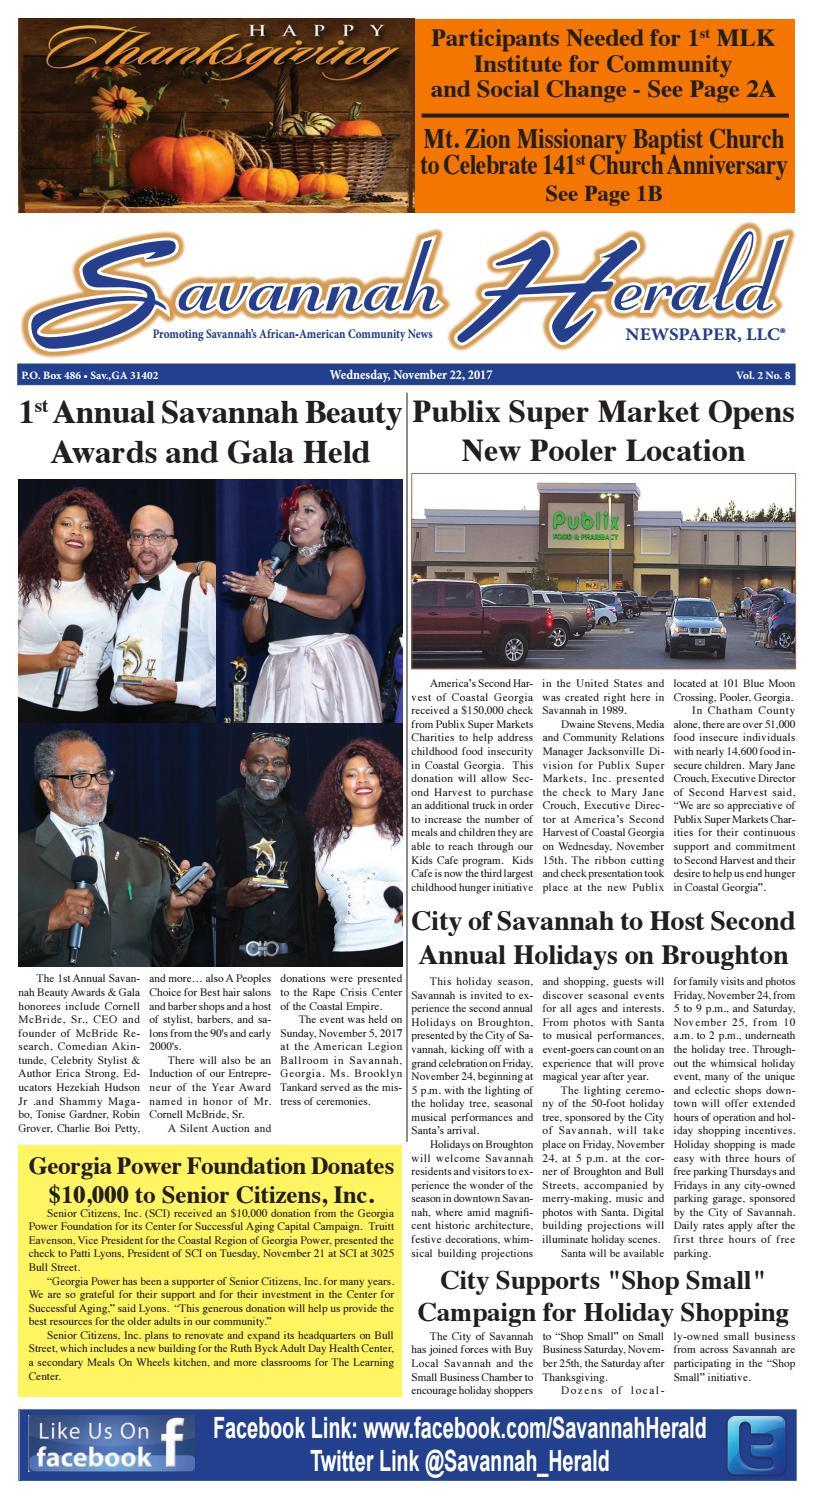 Savannah Herald Newspaper (11-22-17) by Savannah Herald Newspaper ...